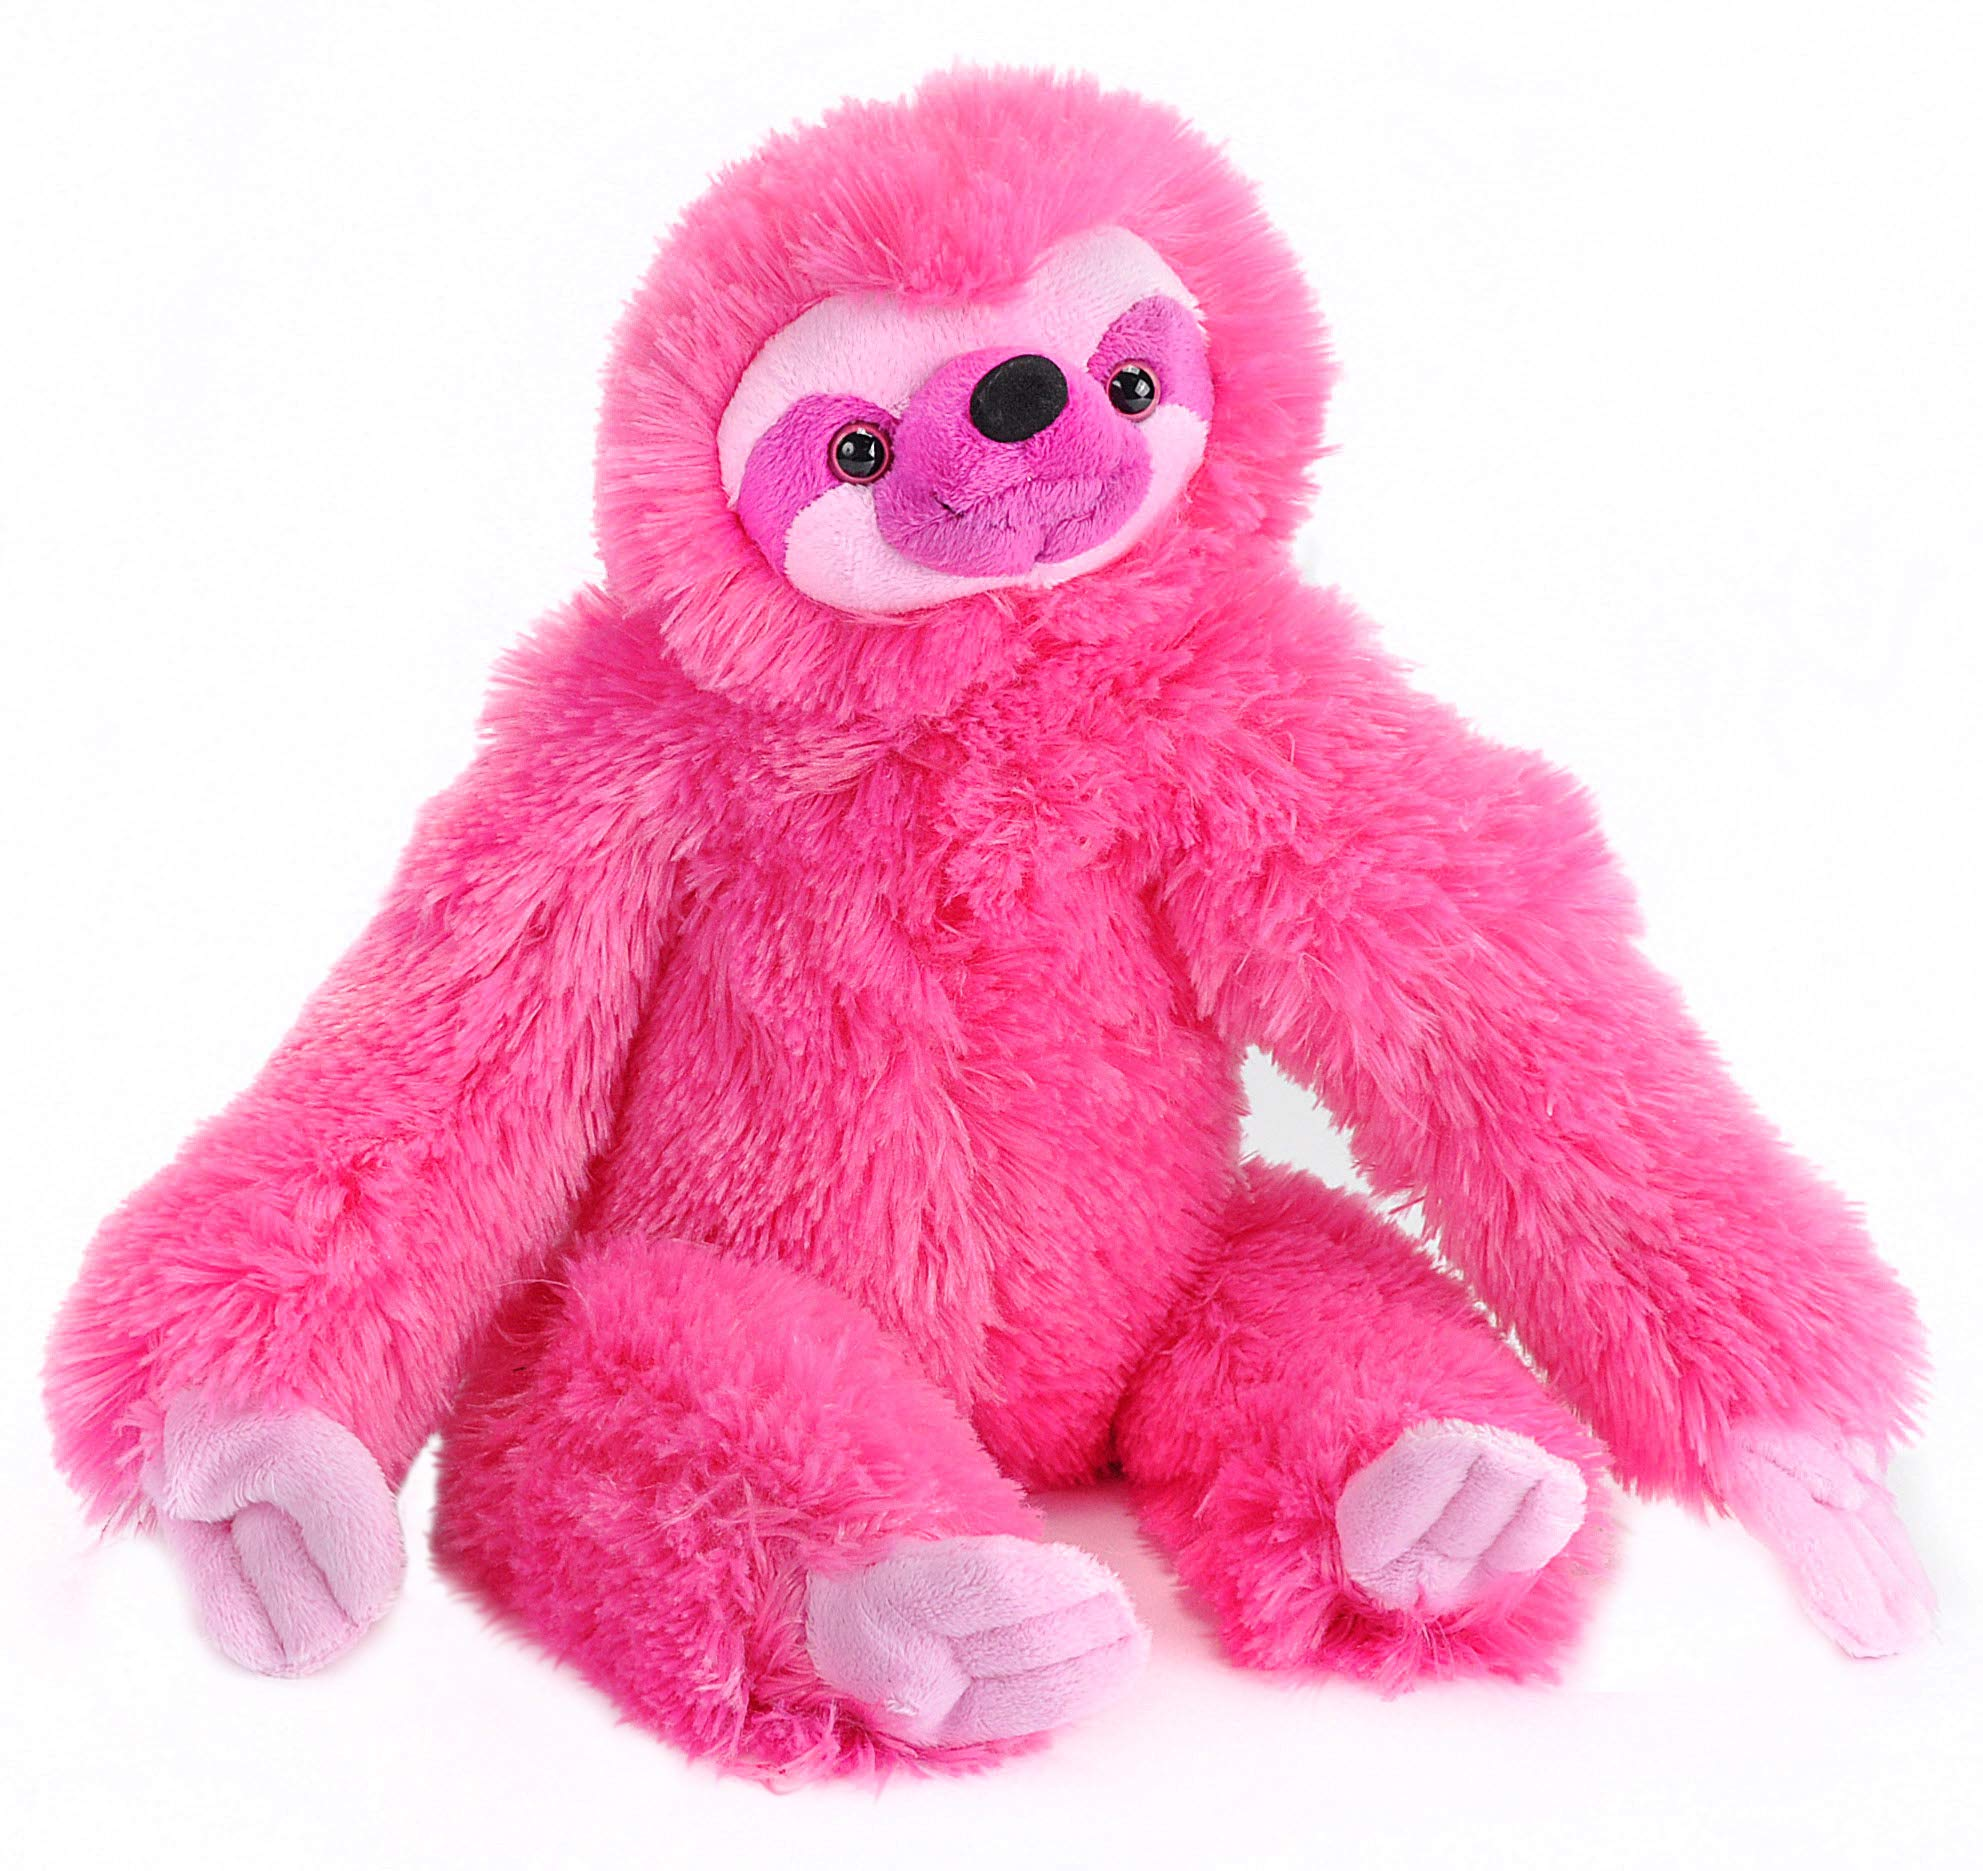 "Wild Republic Three-Toed Sloth Plush, Stuffed Animal, Plush Toy, Gifts For Kids, Pink, Cuddlekins 12"""